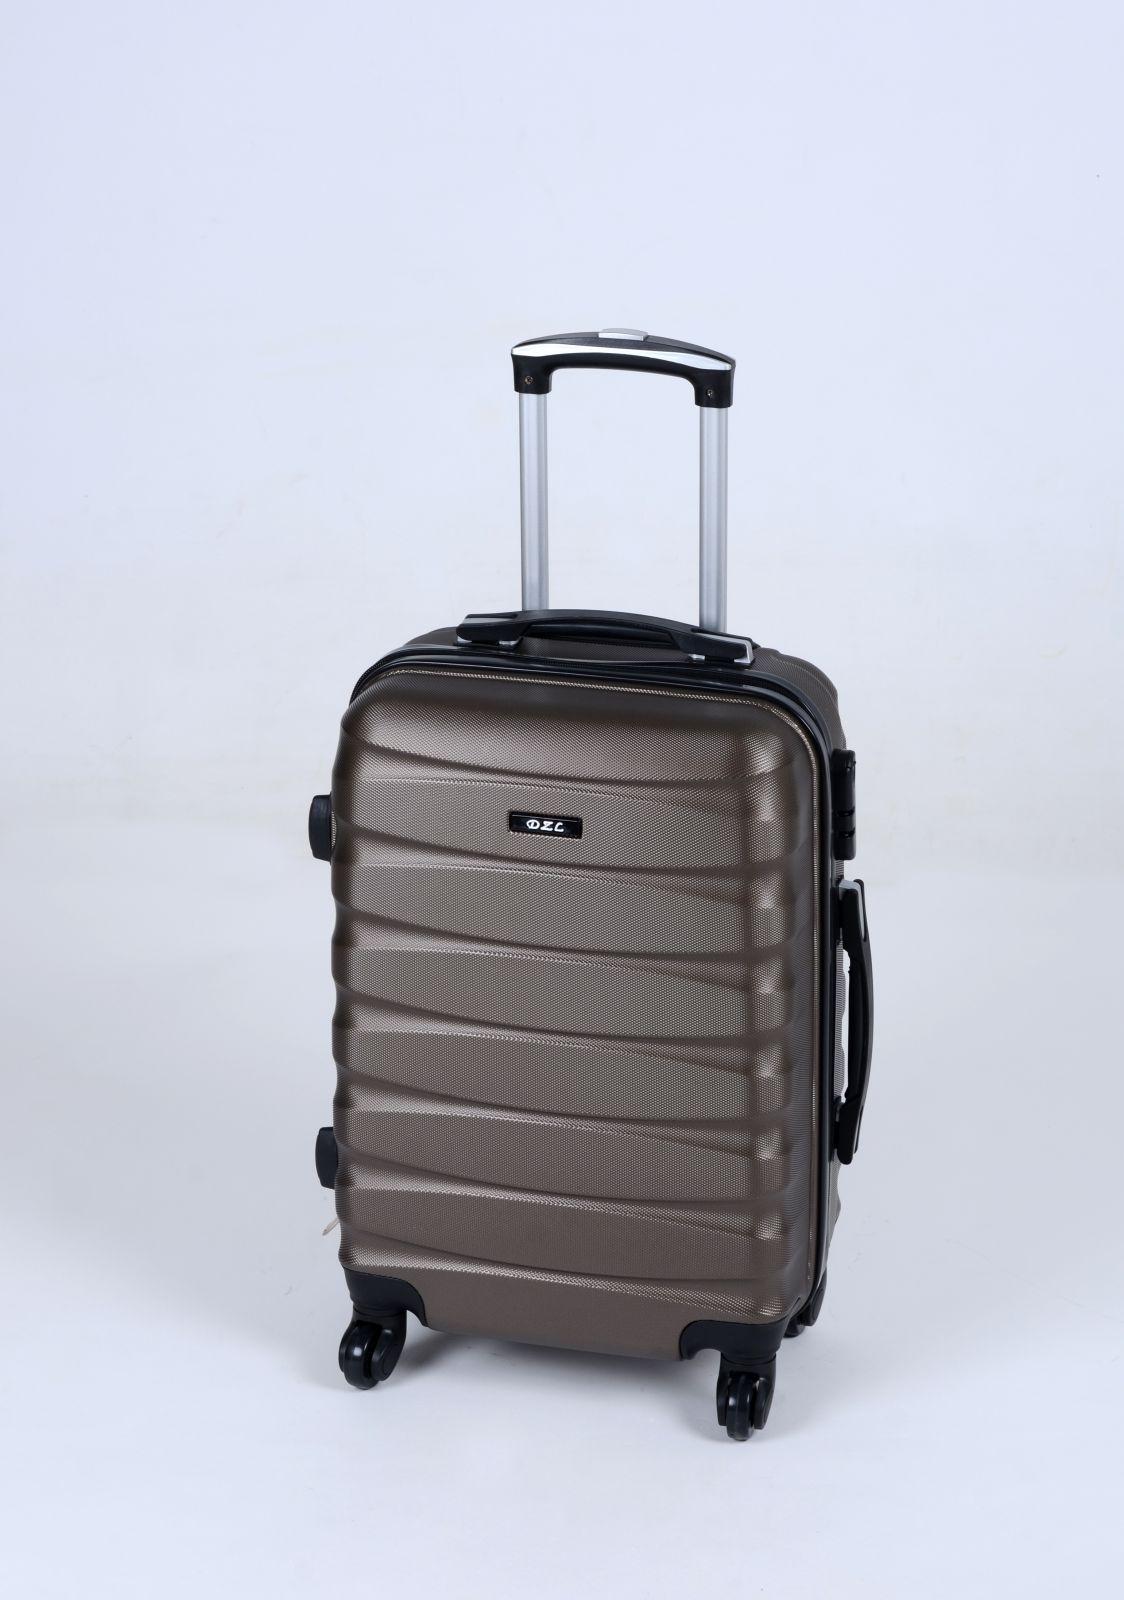 kabinový kufr  TR-A30 BRONZE BRIGHT xS